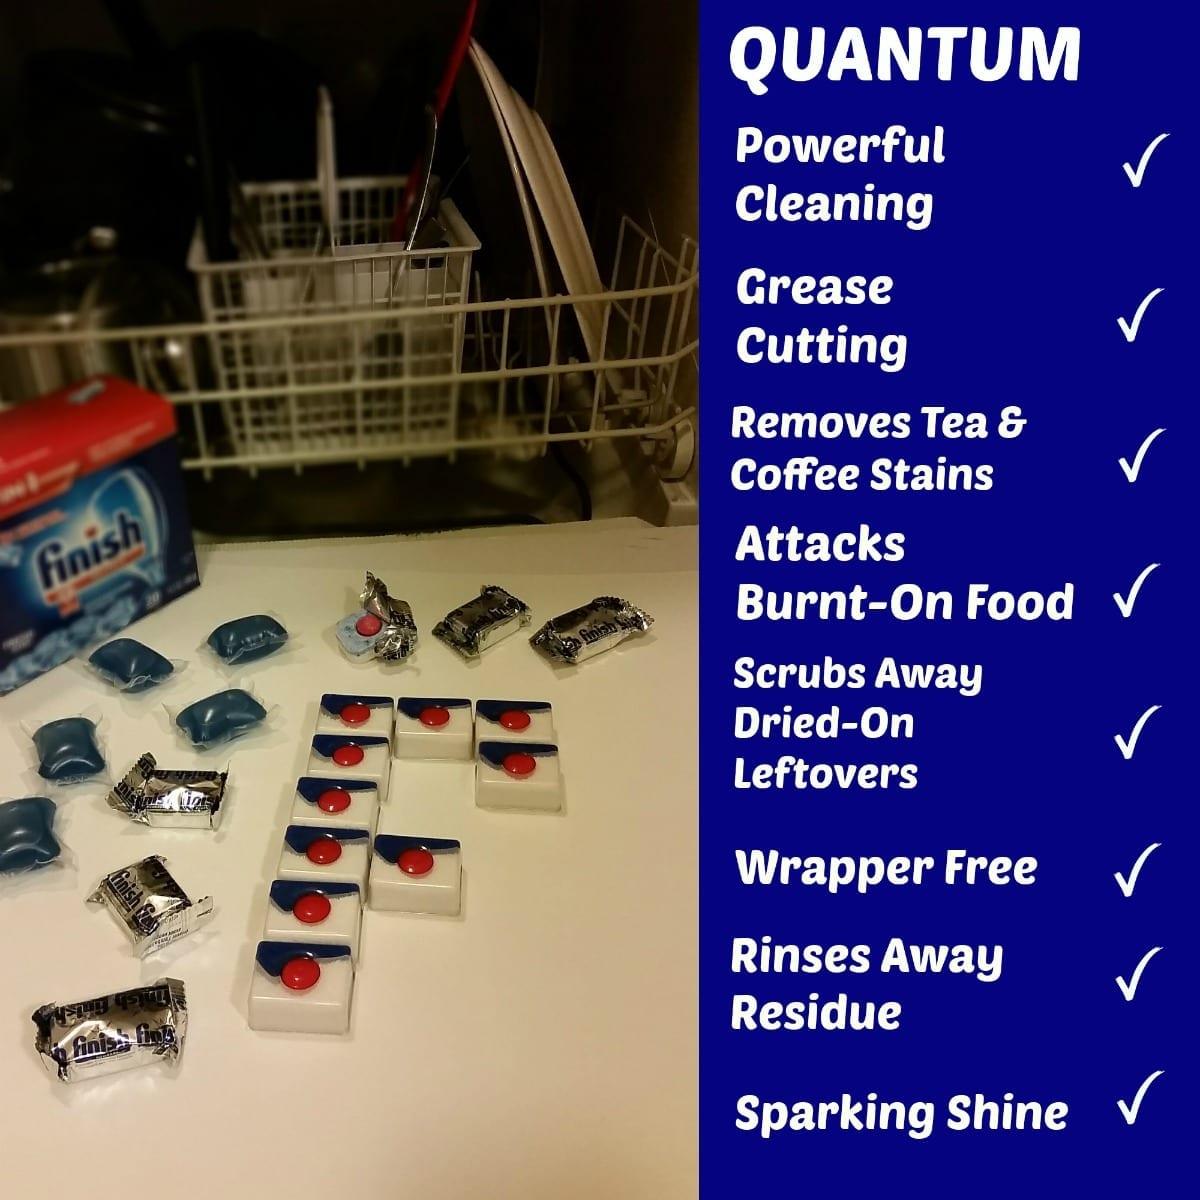 Finish® Quantum Dishwasher Detergent: Rollback Savings Plus Coupon